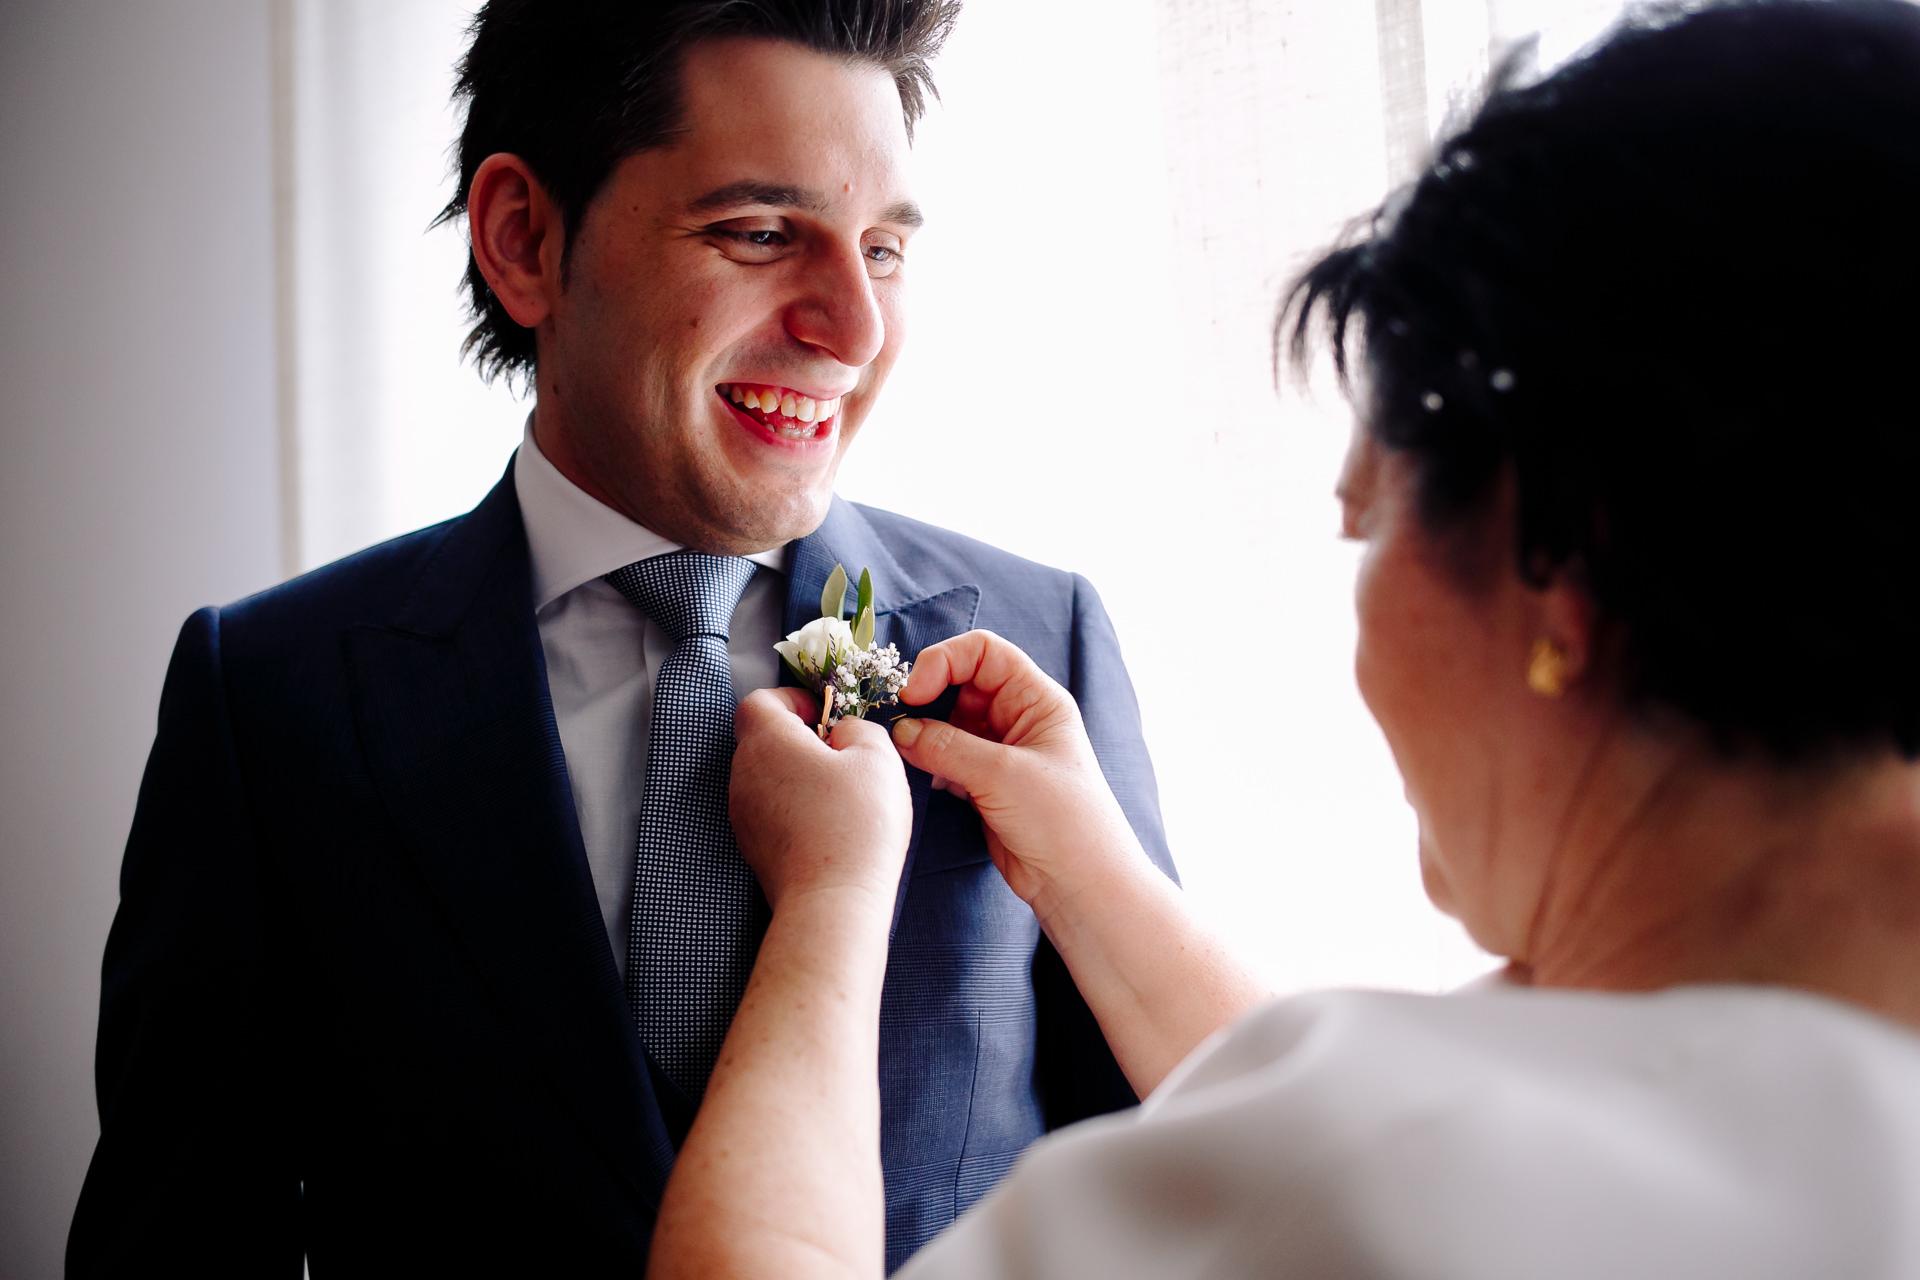 boda civil eguren ugarte la rioja 105857